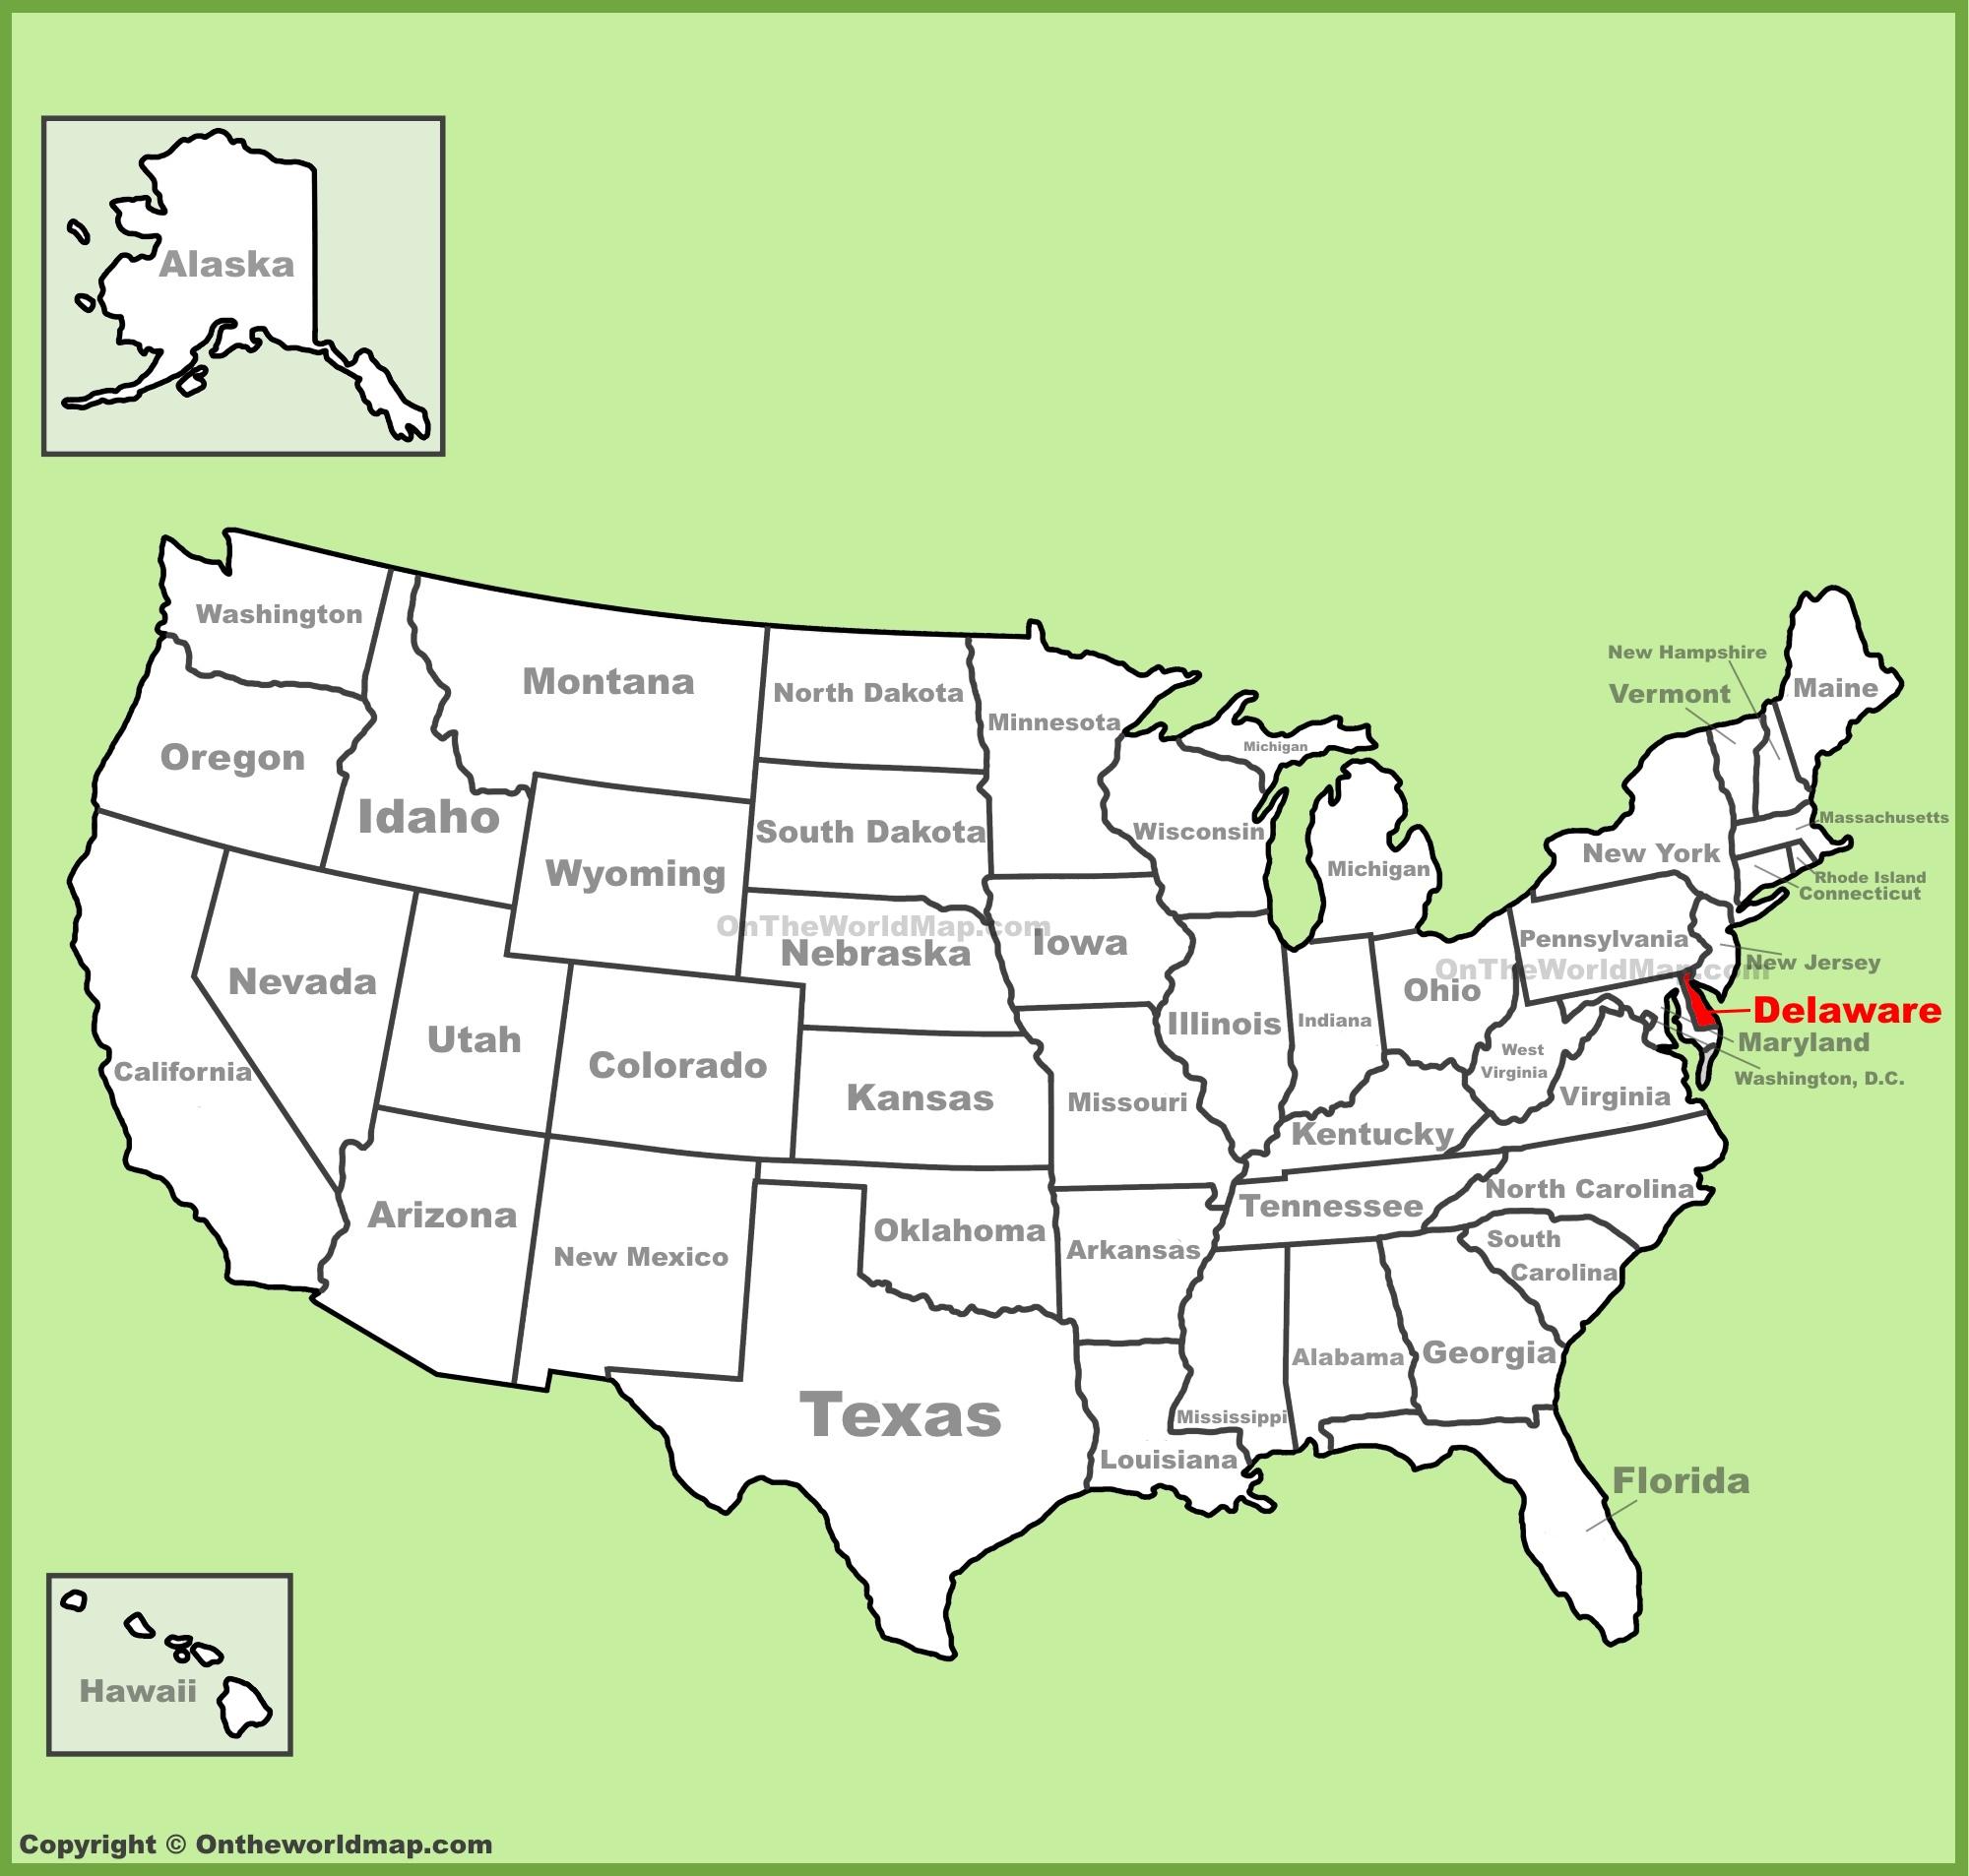 Delaware State Map Delaware State Maps | USA | Maps of Delaware (DE)